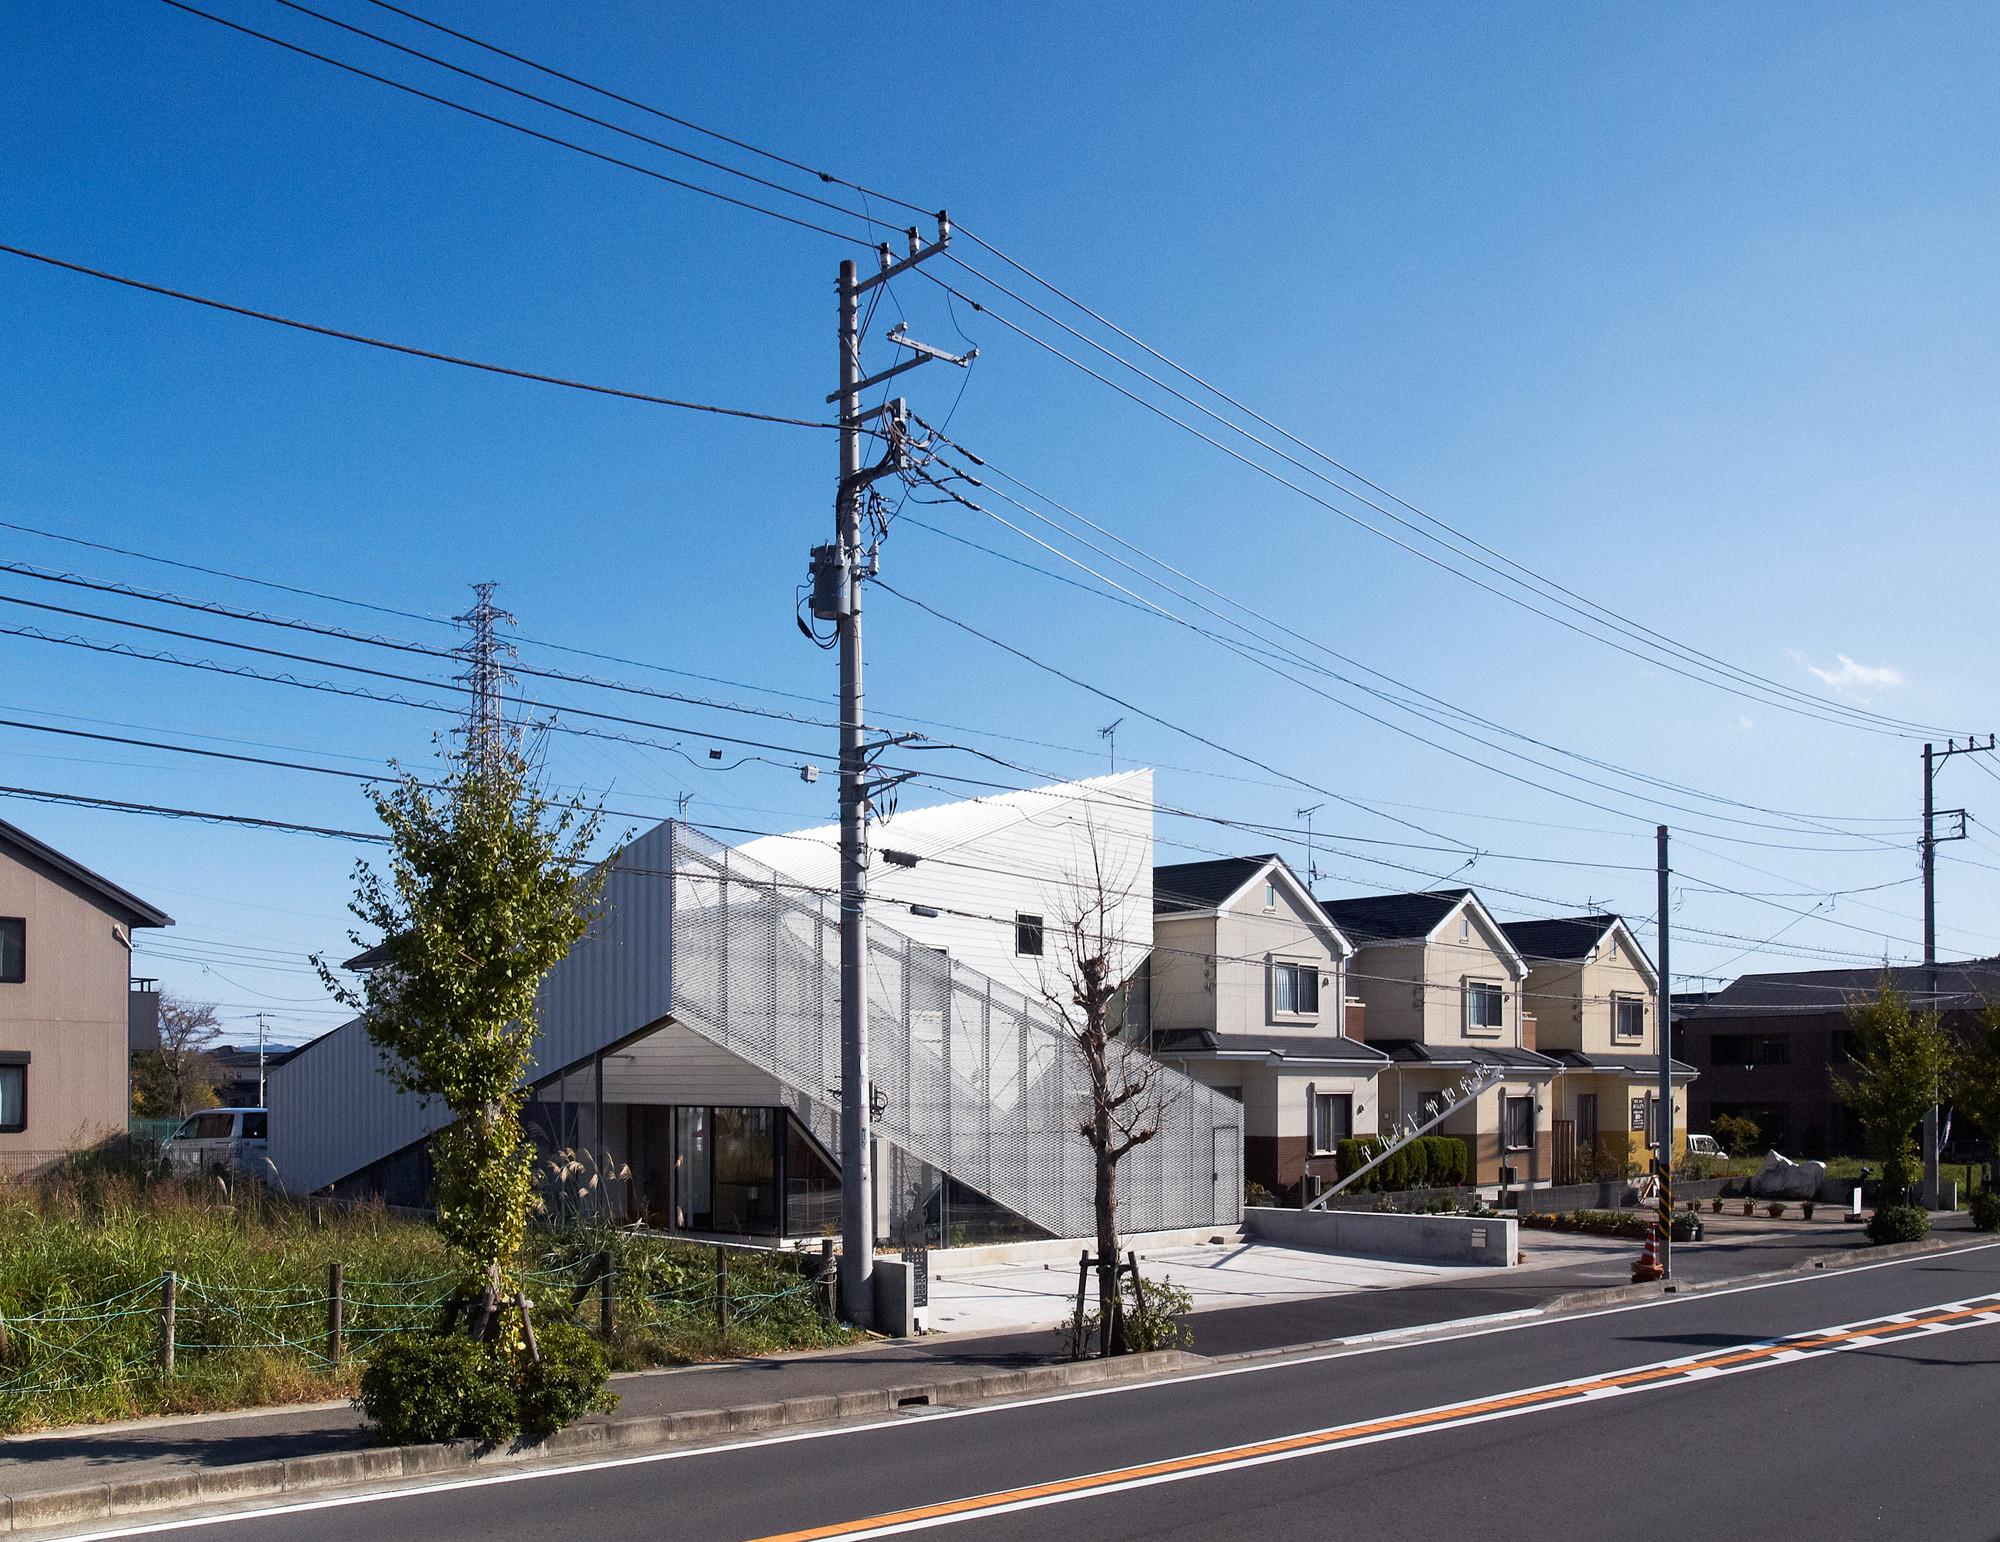 Veterinarian N House / Eureka + Atelier CHOCOLATE, © Ookura Hideki